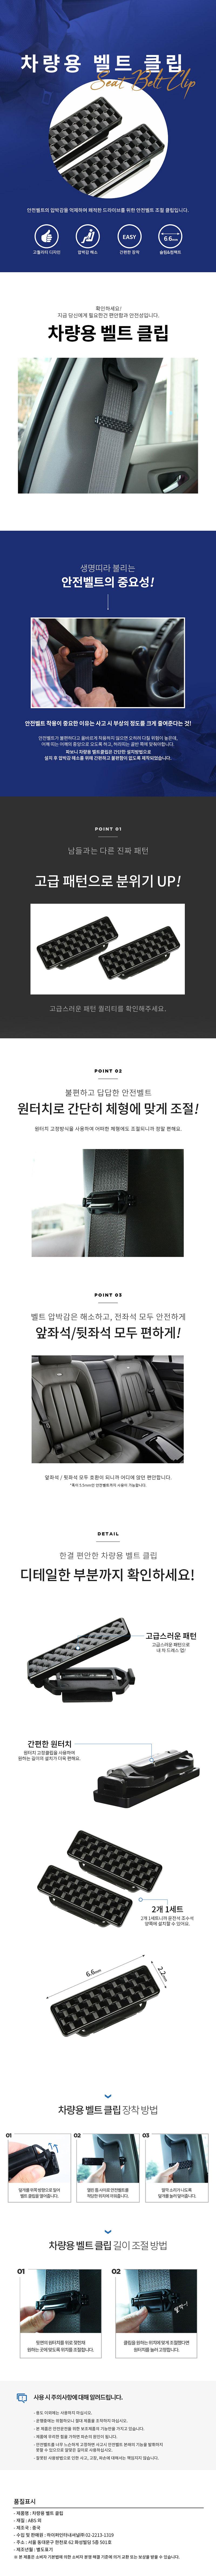 seat_belt_clip_235519.jpg